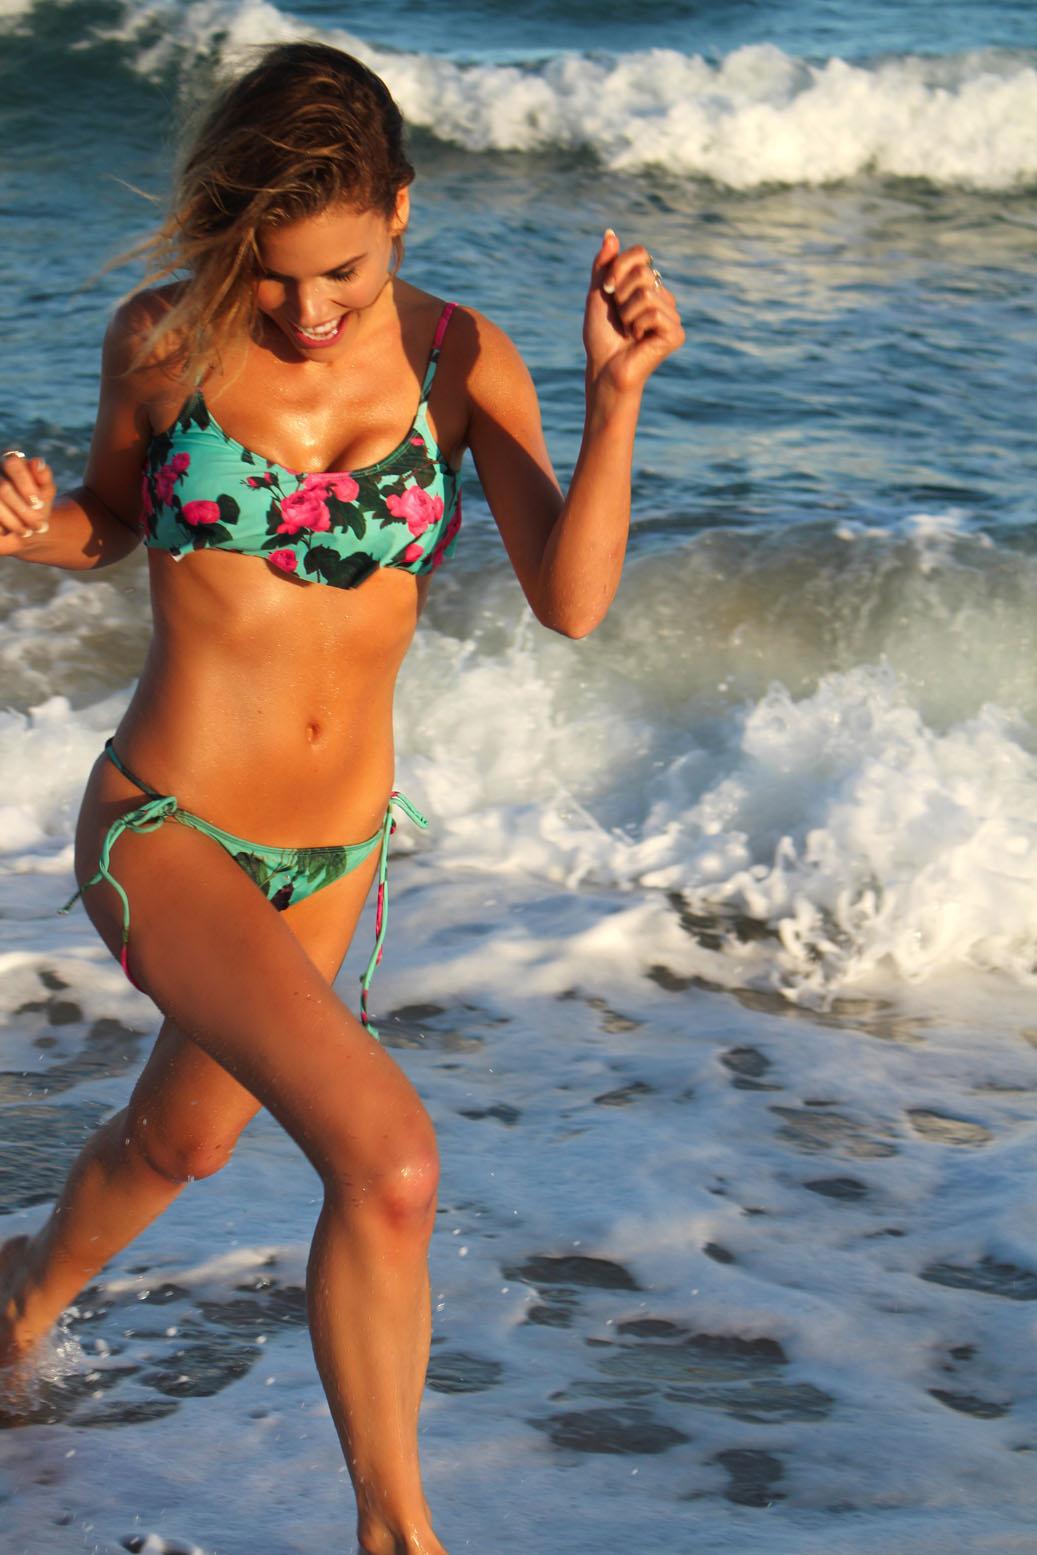 Rosalind Lipsett 2014 : Rosalind Lipsett Bikini Photos: Beach Riot Shoot -09